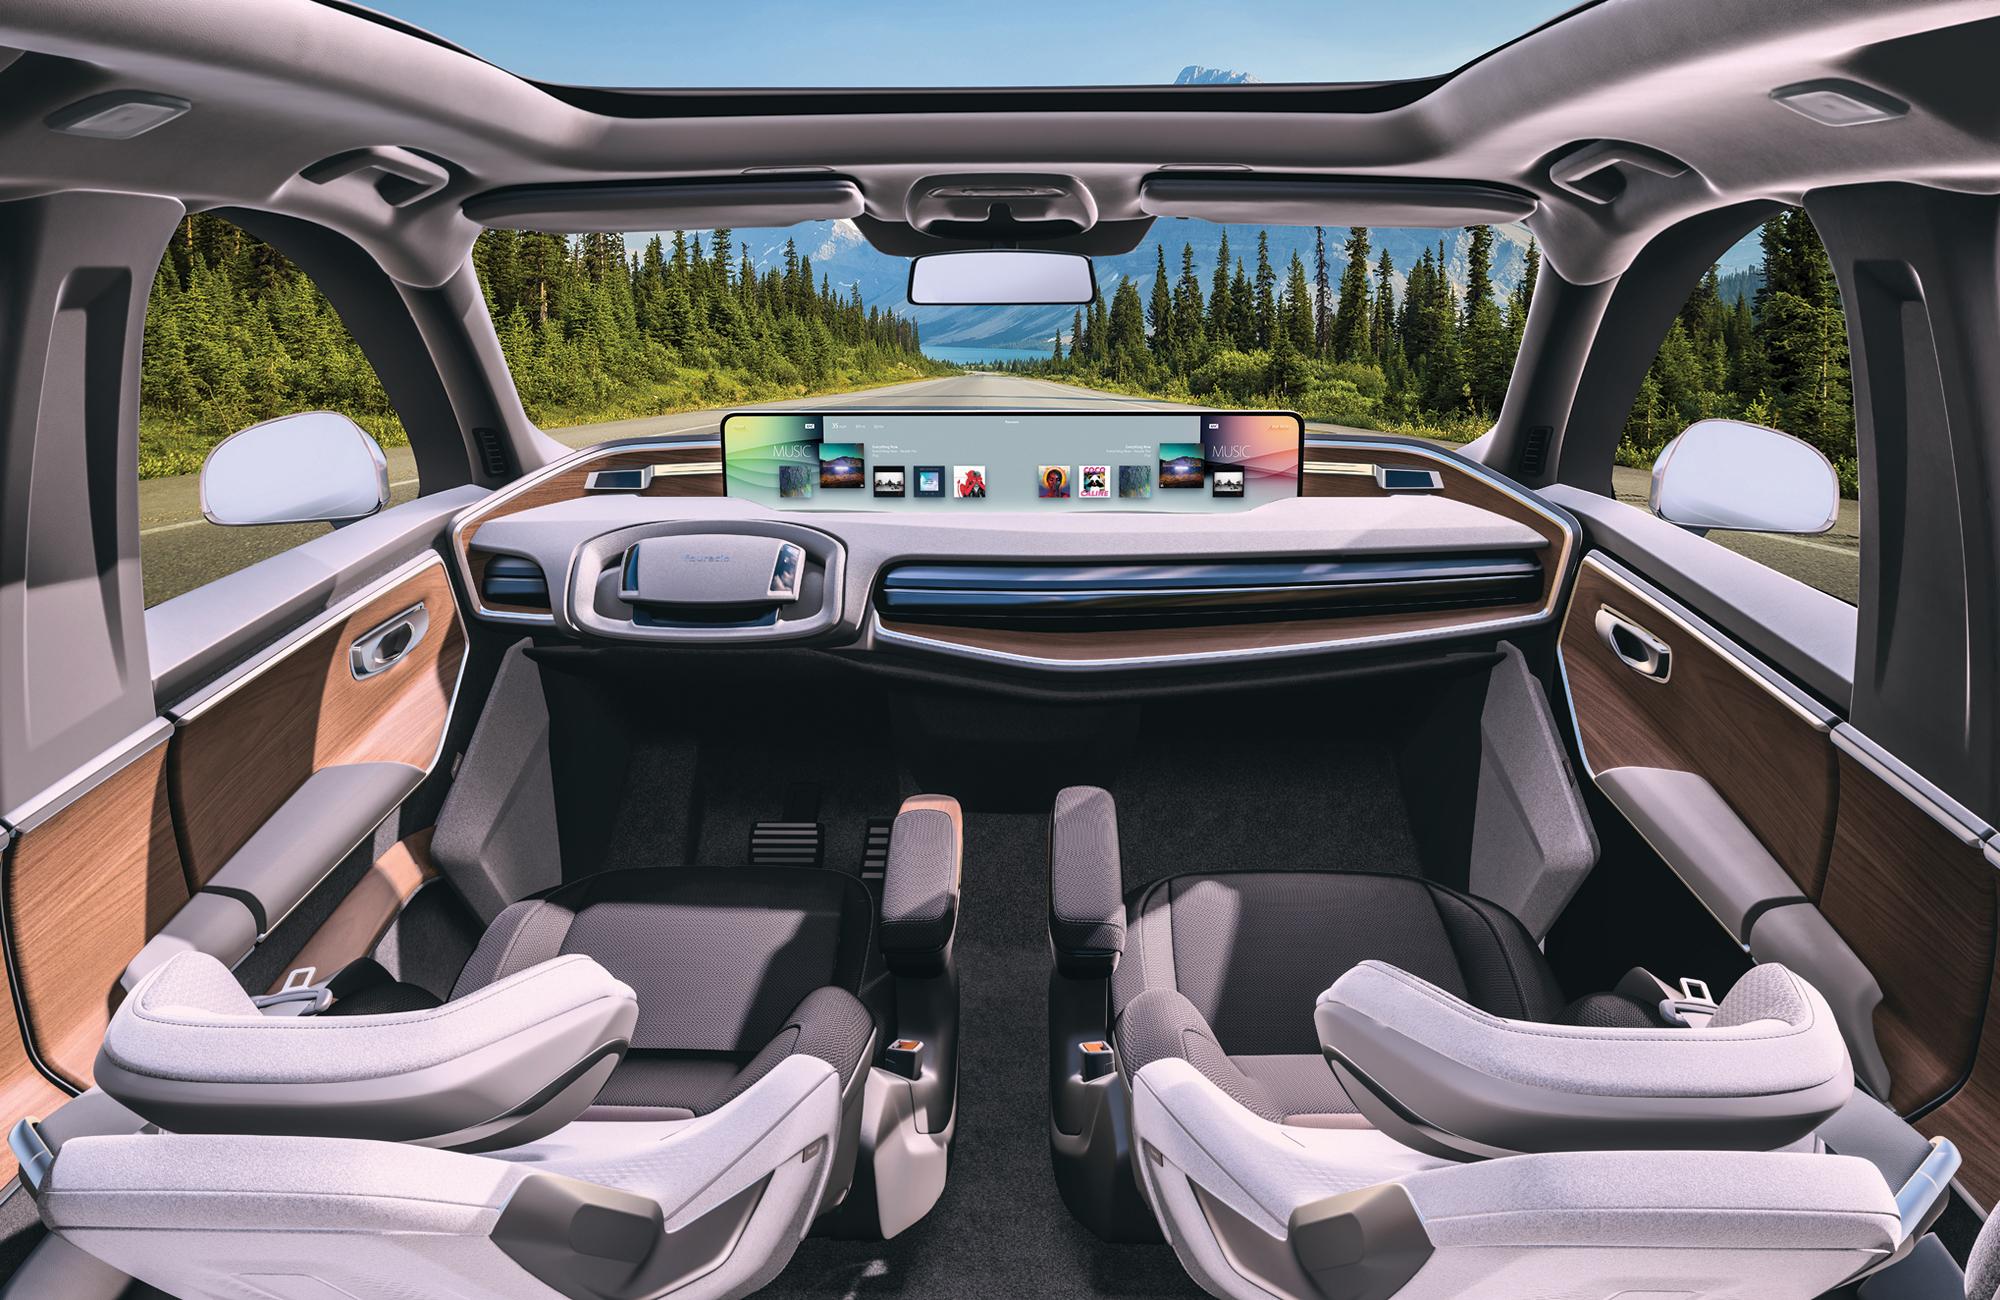 Auburn Hills, el búnker de Faurecia donde resguarda la cabina del auto del futuro